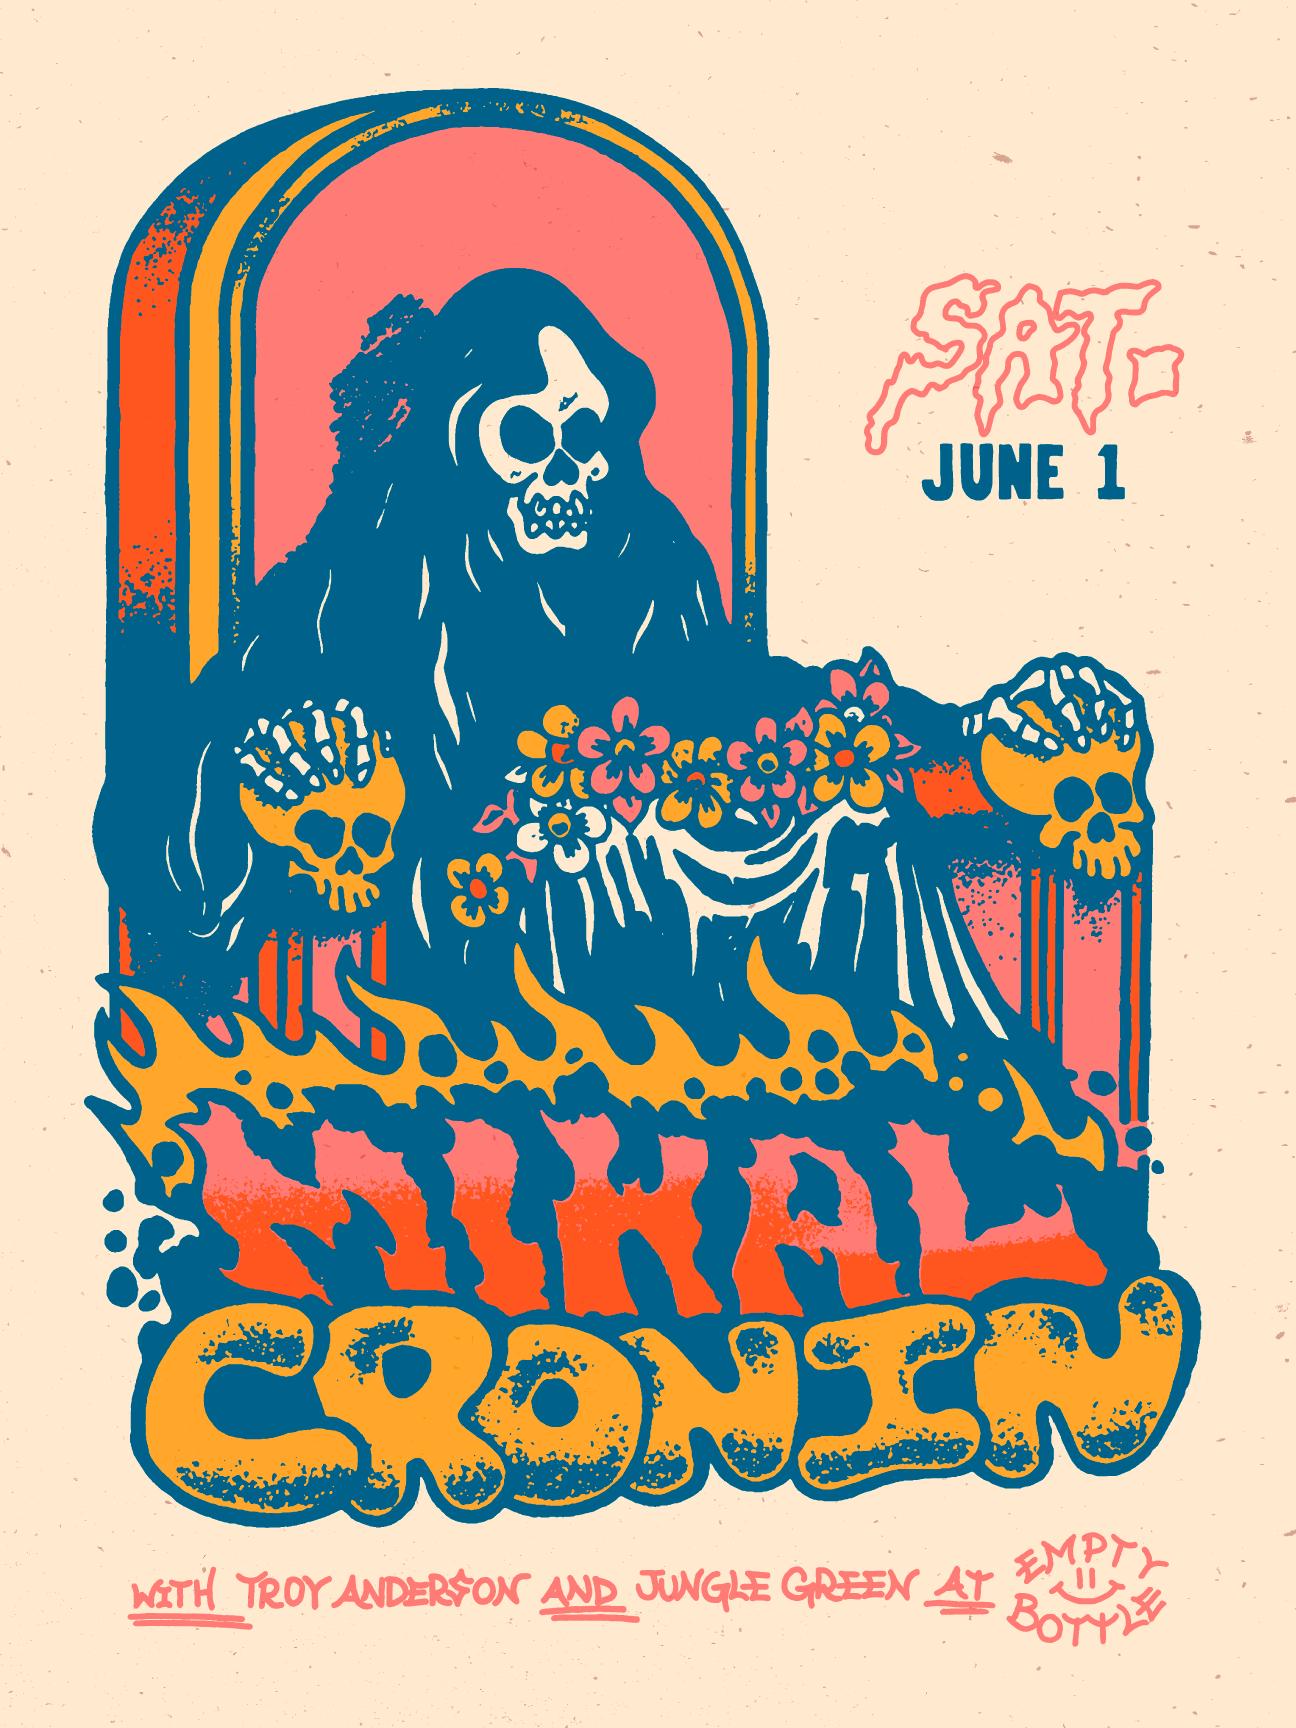 mikal-cronin-1.png